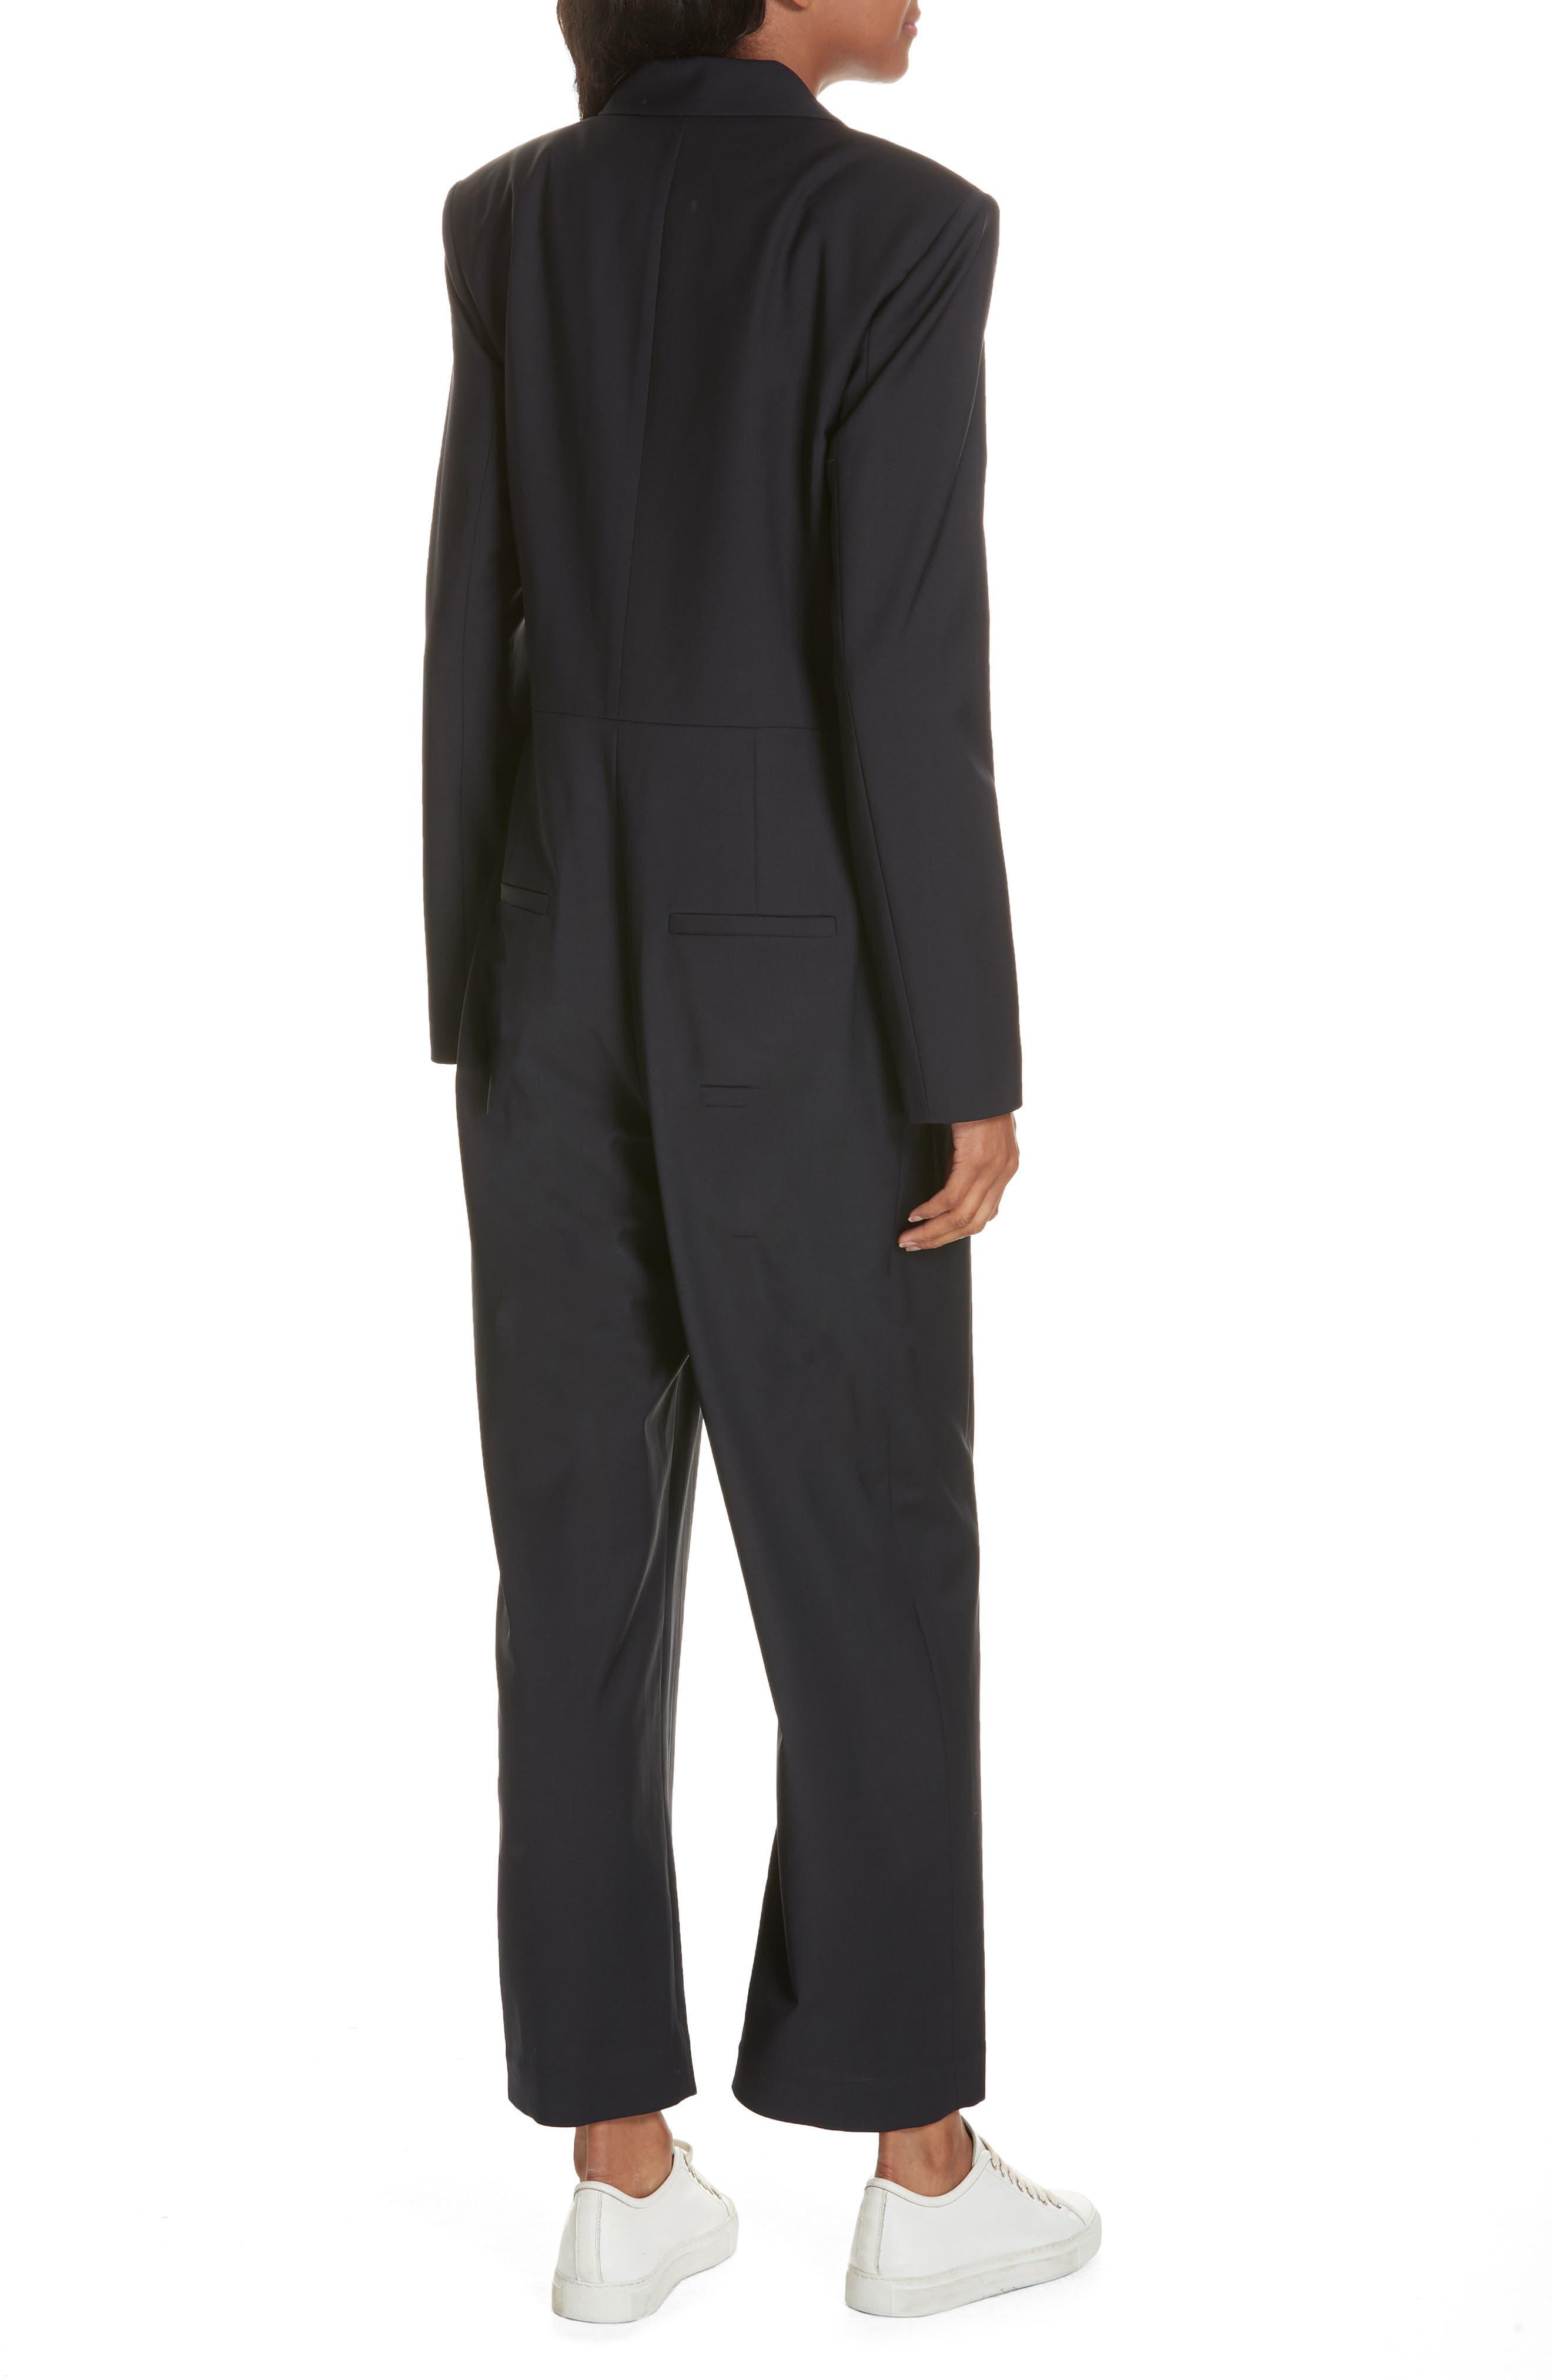 TIBI,                             Plain Weave Blazer Jumpsuit,                             Alternate thumbnail 2, color,                             DARK NAVY